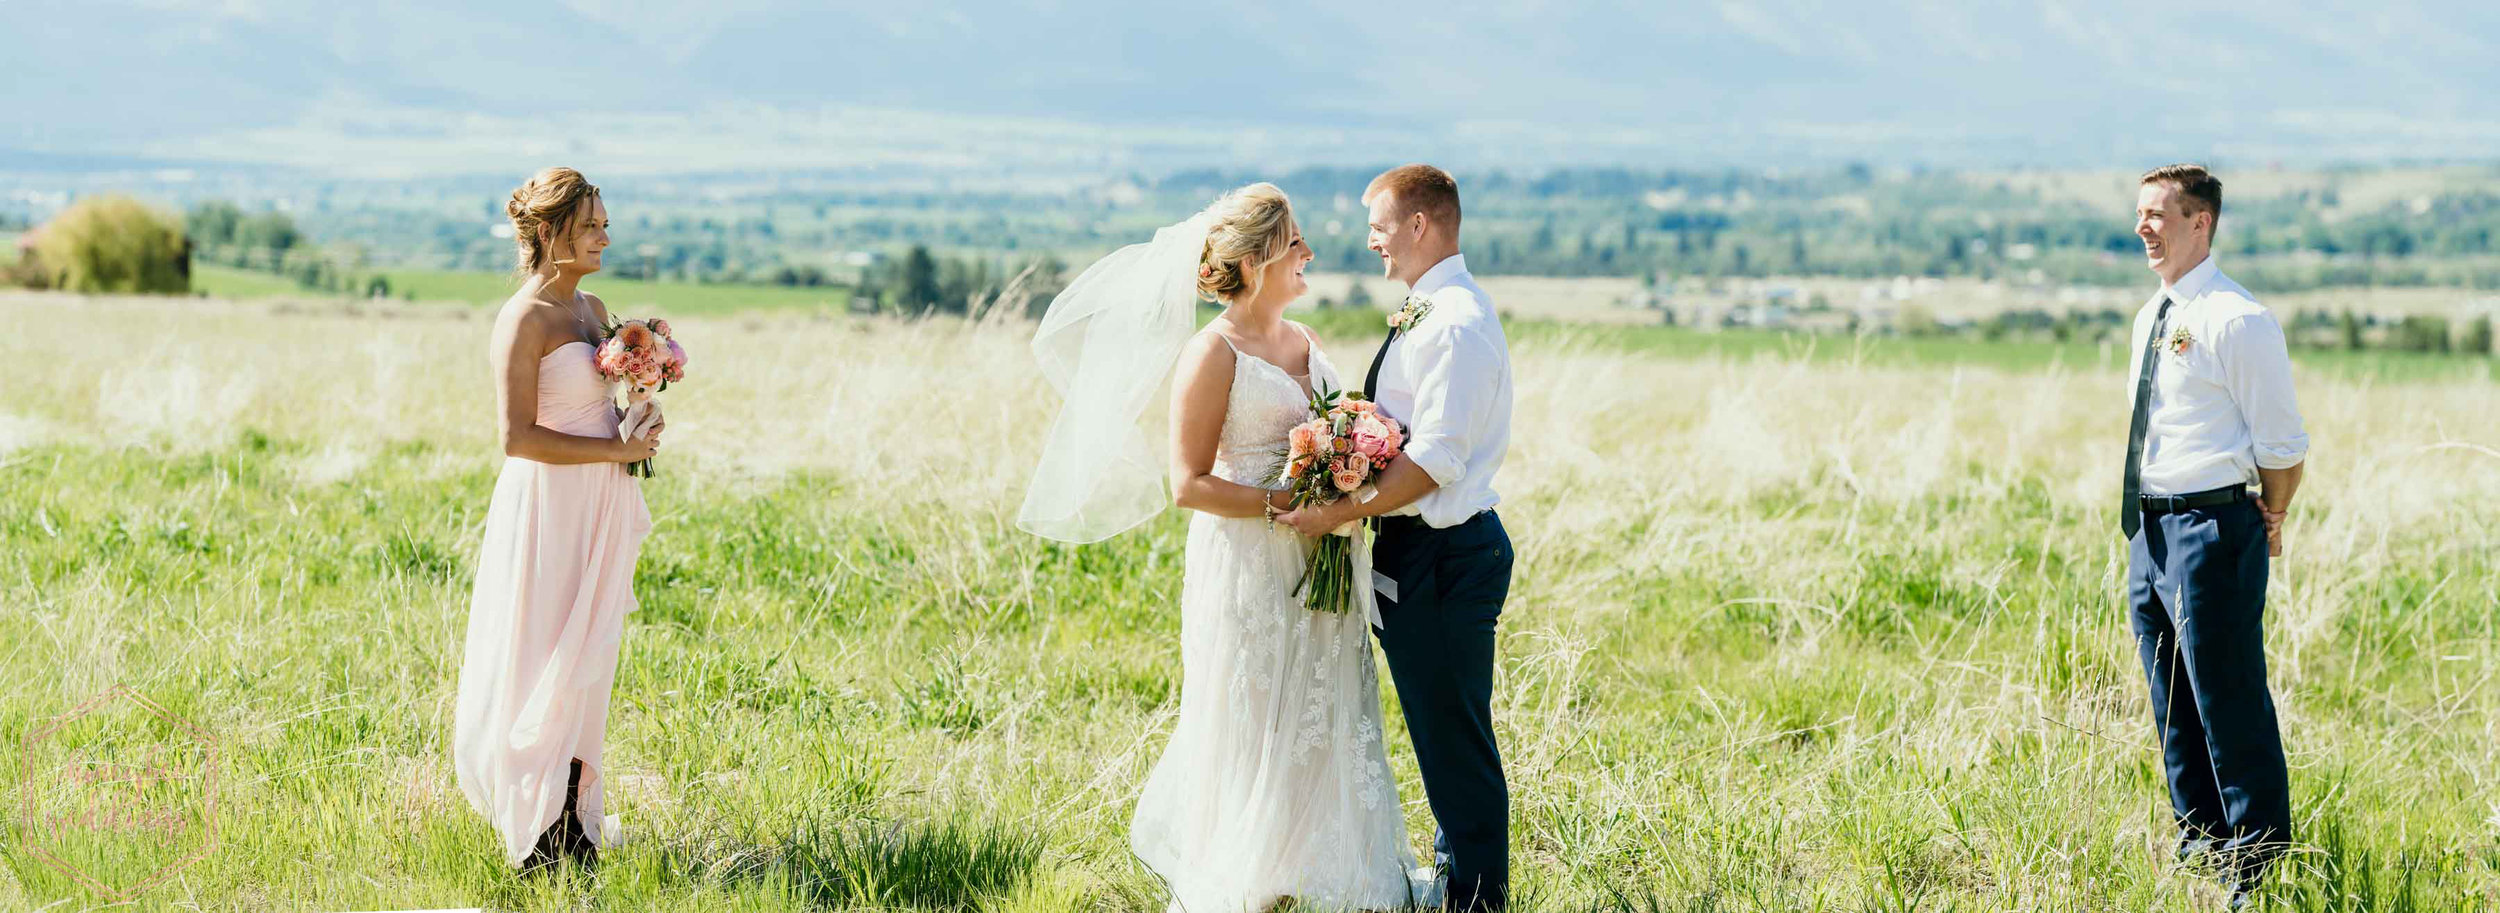 73 Montana Wedding Photographer_Doherty 2018-2417-Pano.jpg